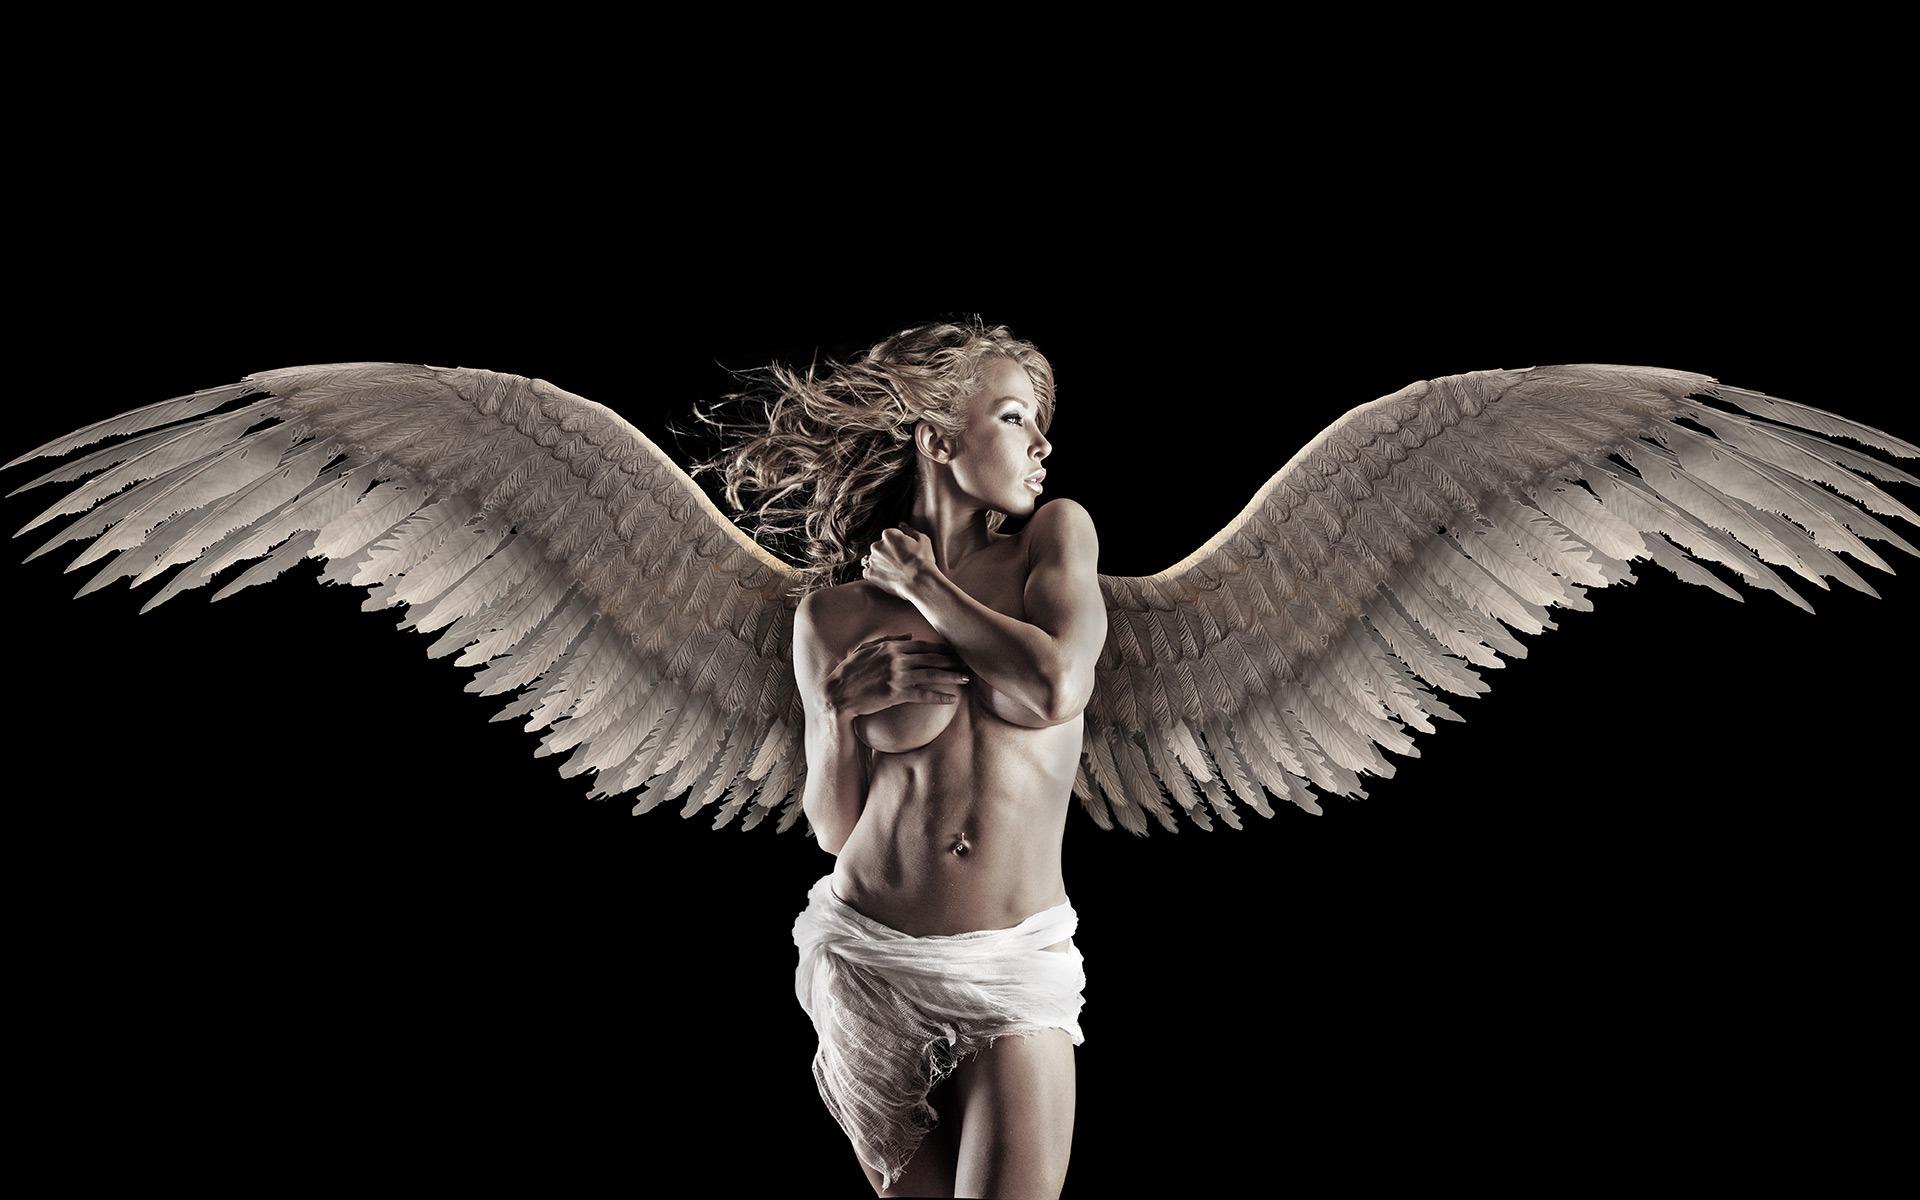 Sexy angel desktops